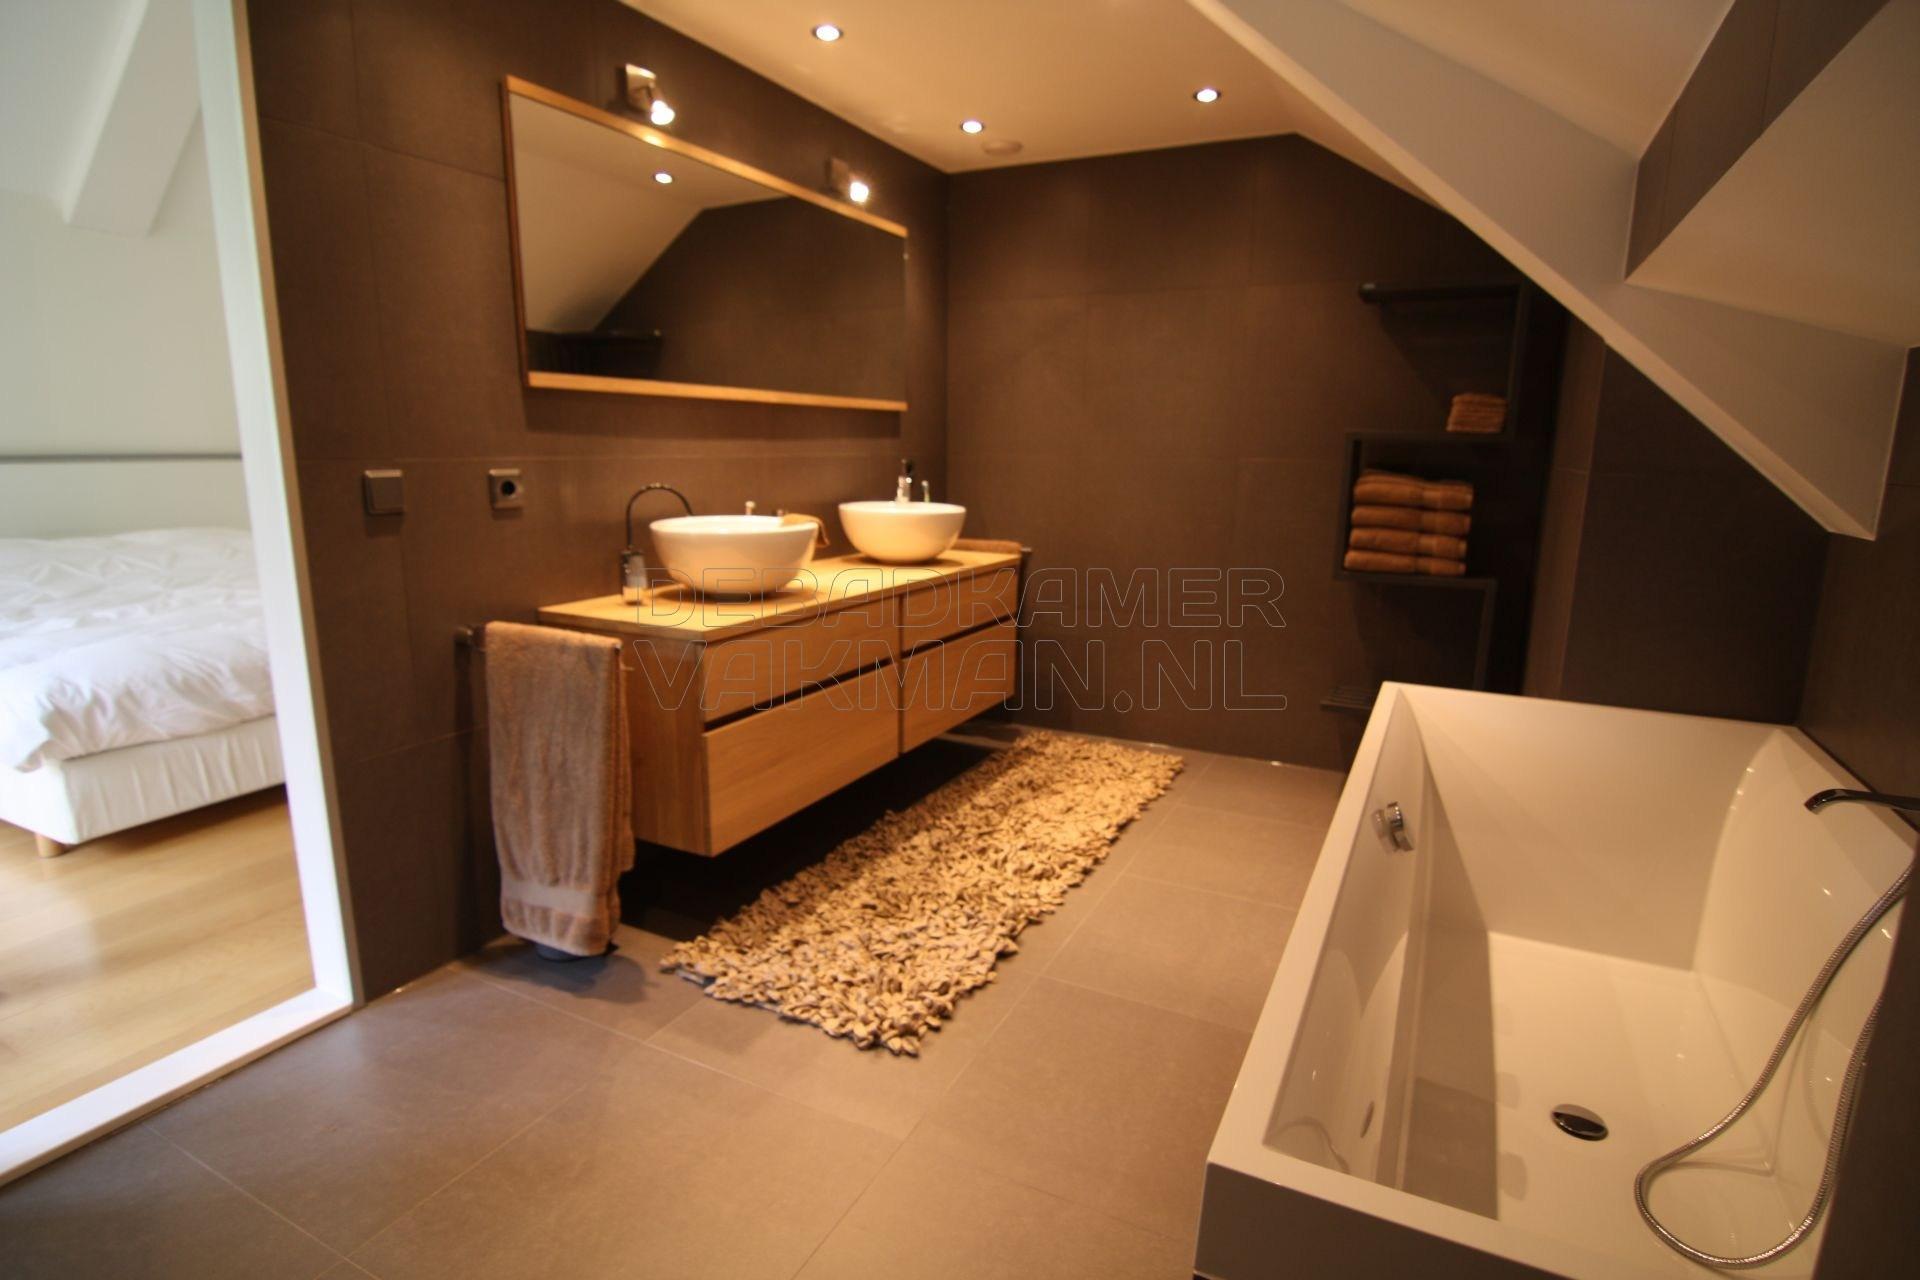 Gestucte Badkamer Nadelen : Badkamervakman u2013 complete badkamer verbouwingen u2013 1500 succesvolle